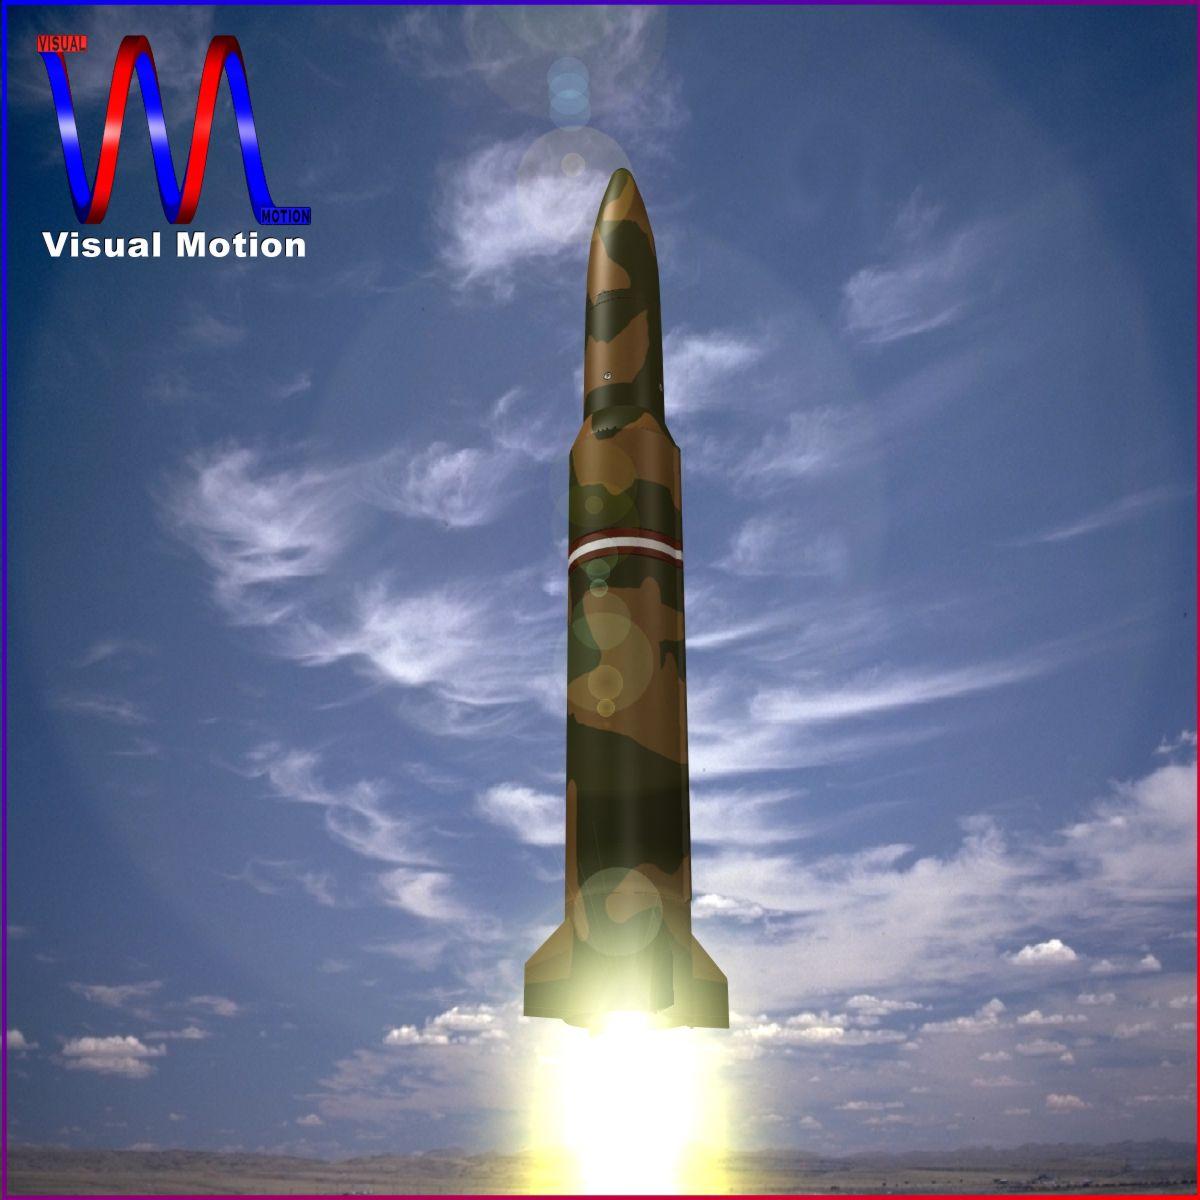 БНХАУ DF-16 баллистик пуужин 3d загвар 3ds dxf cob x obj 152669